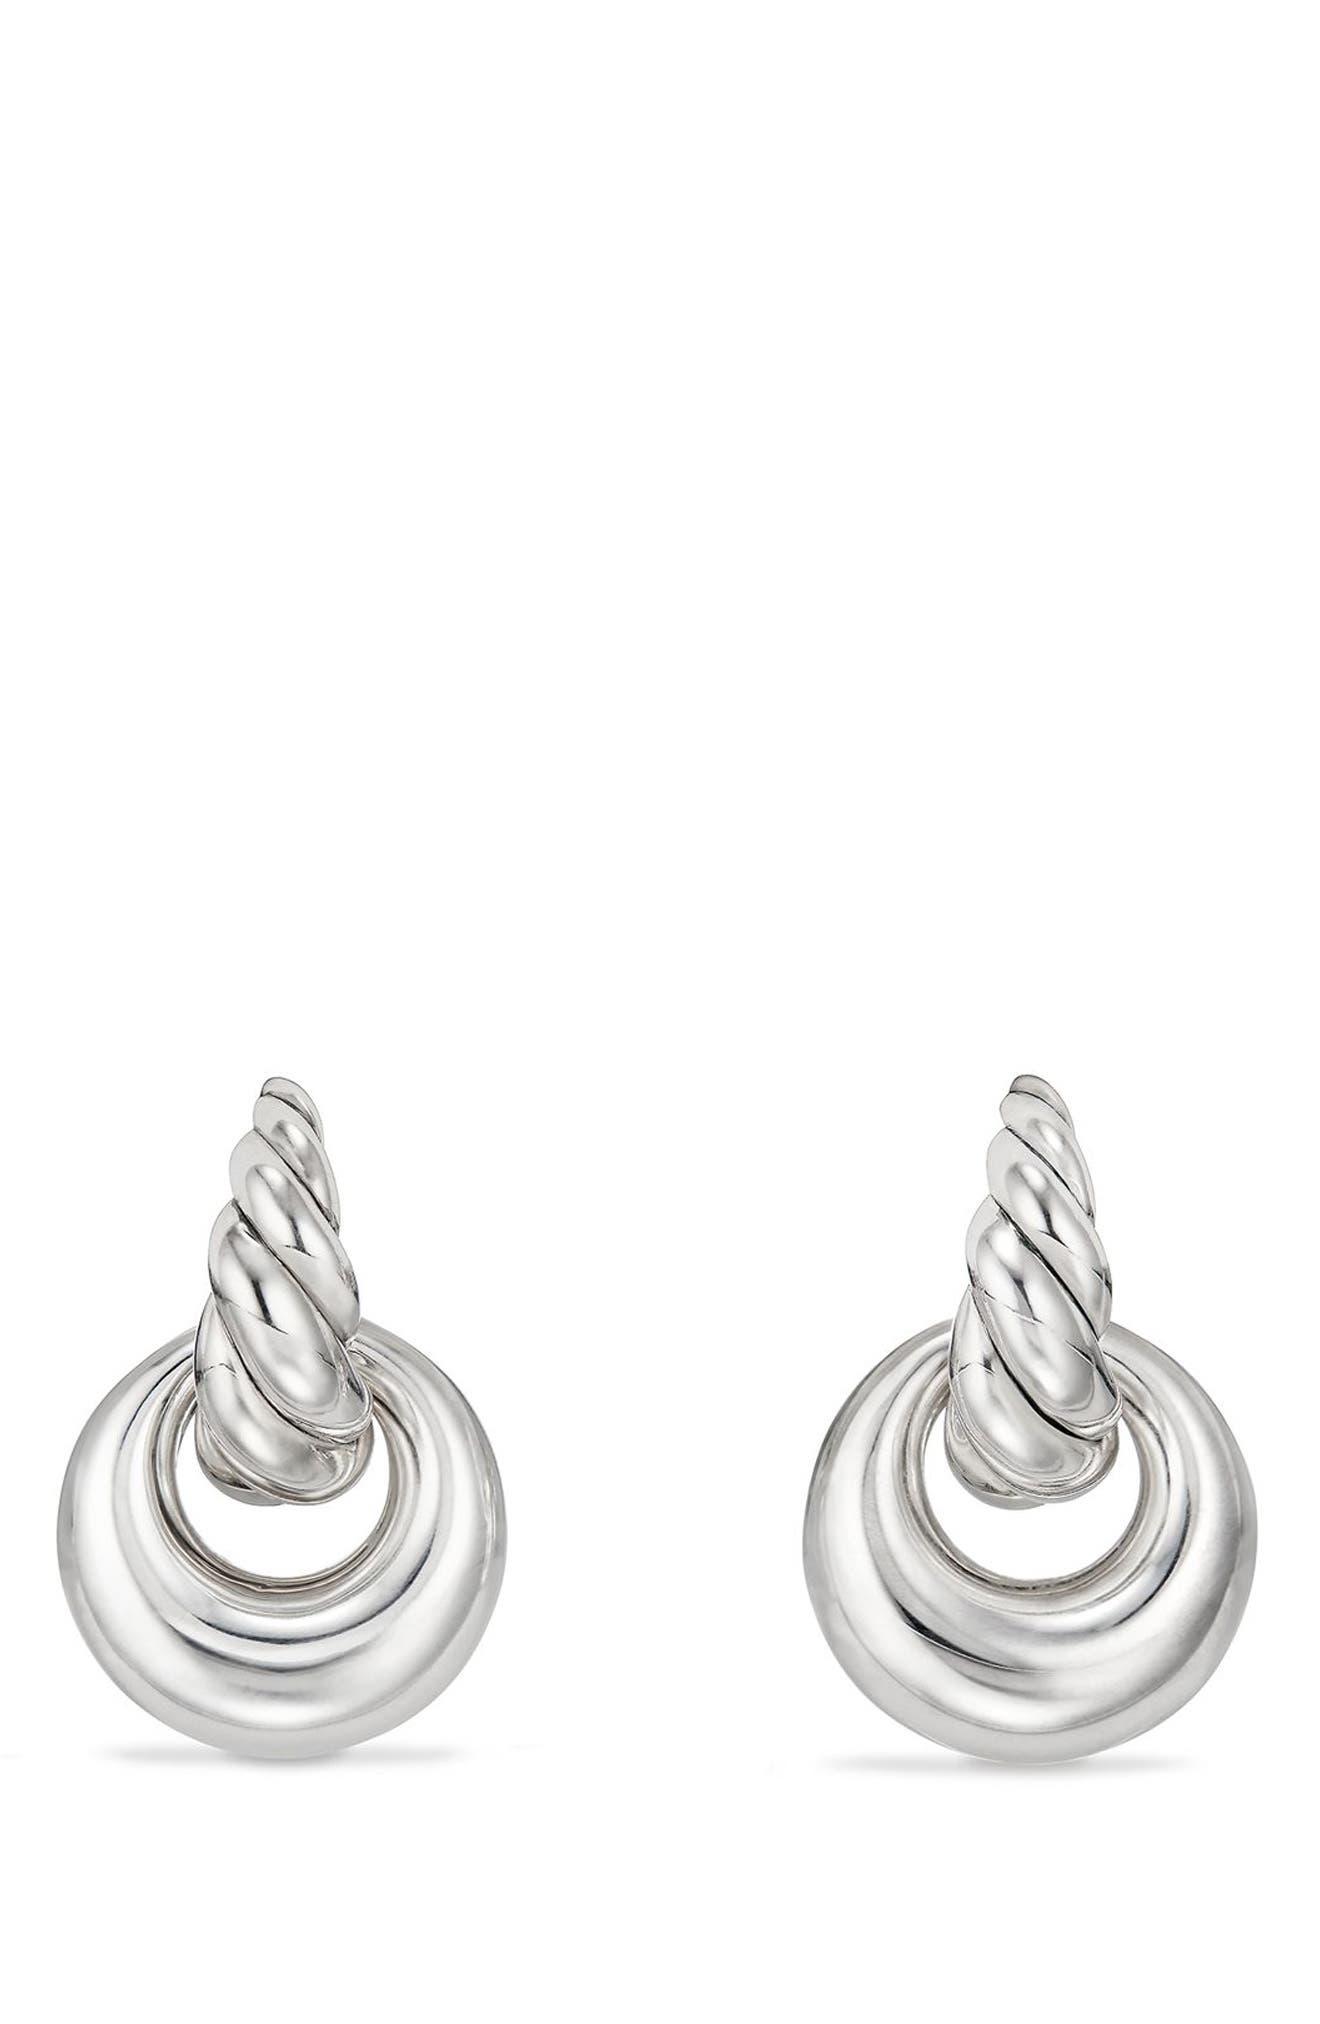 DAVID YURMAN Pure Form Drop Earrings, Main, color, SILVER